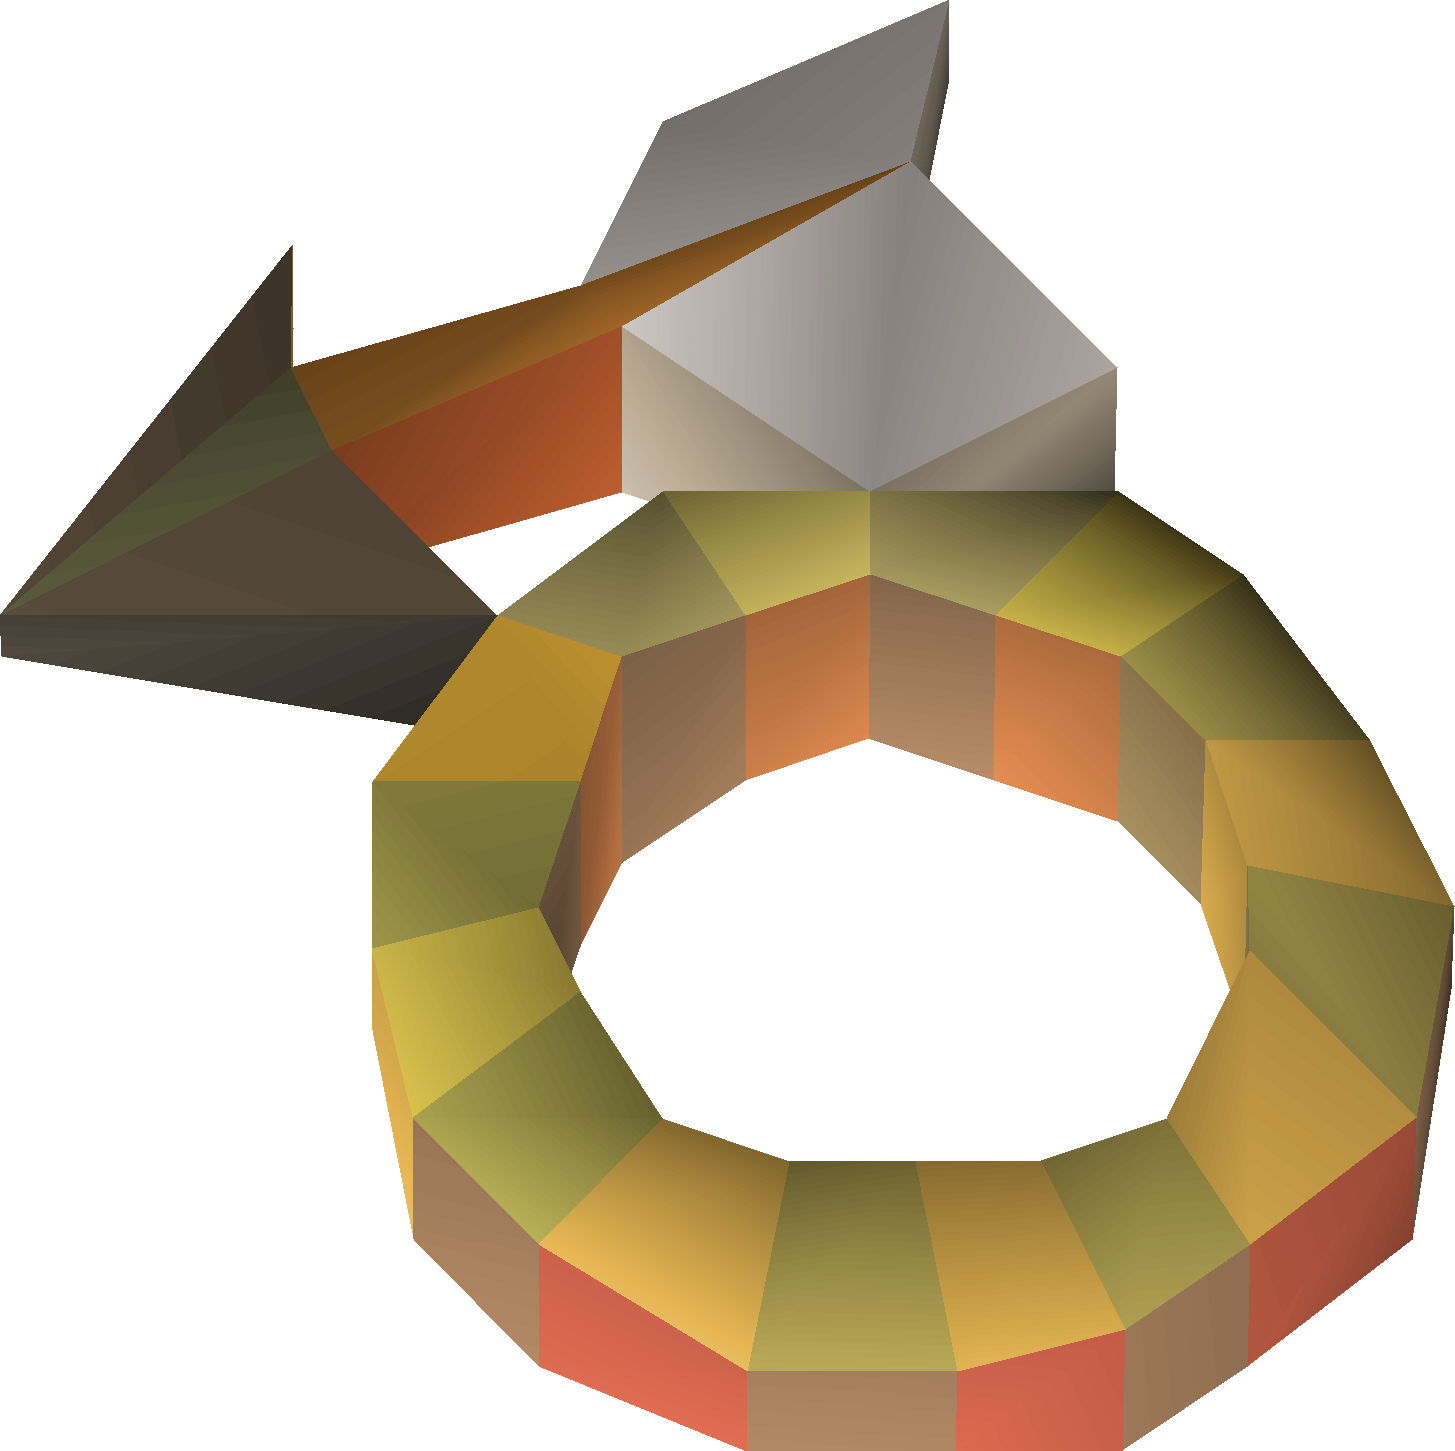 Archers ring - OSRS Wiki